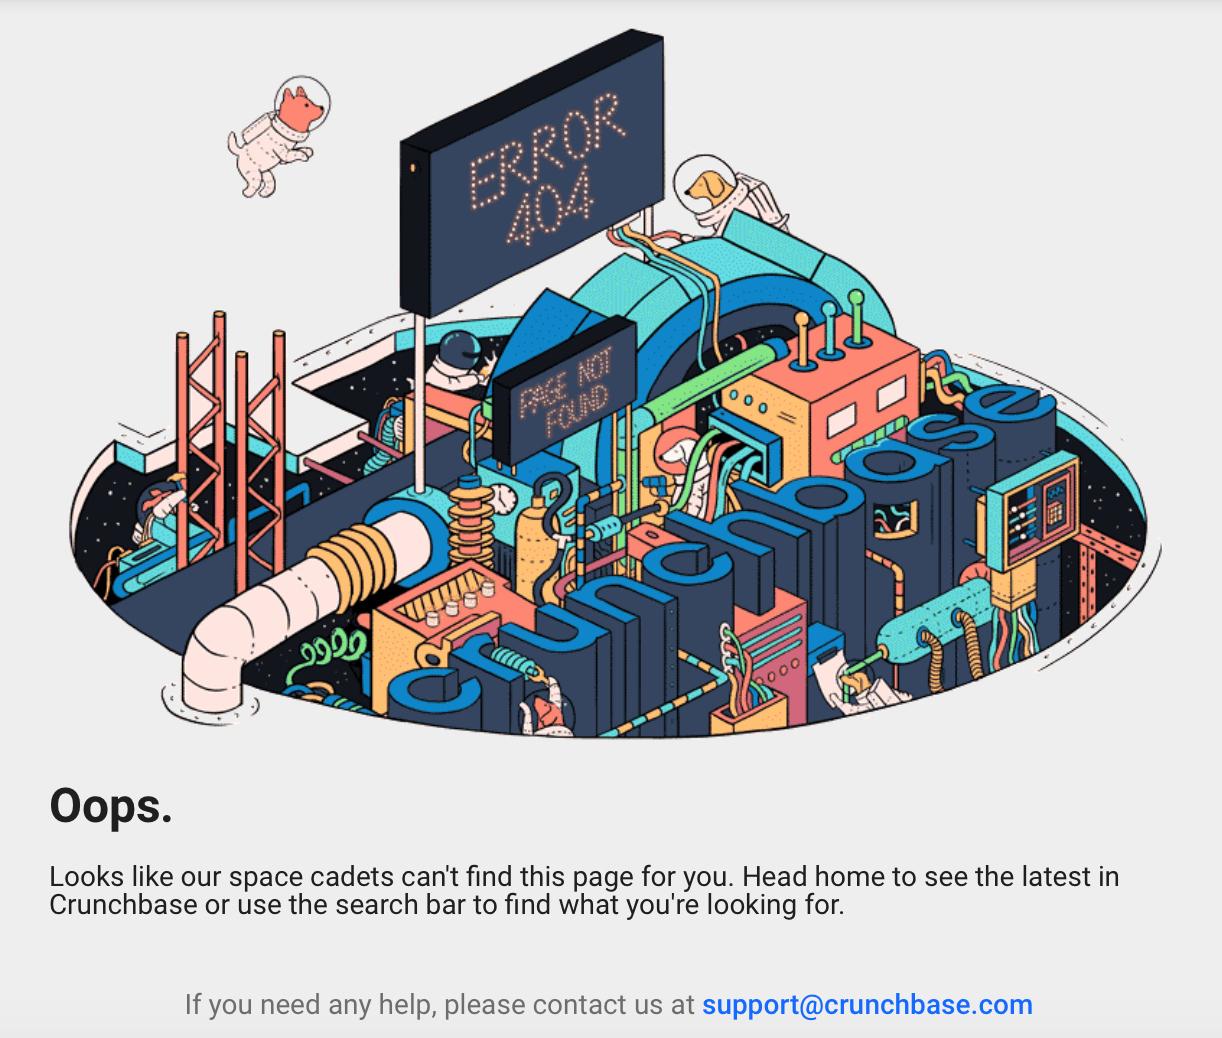 The Crunchbase 404 error page.